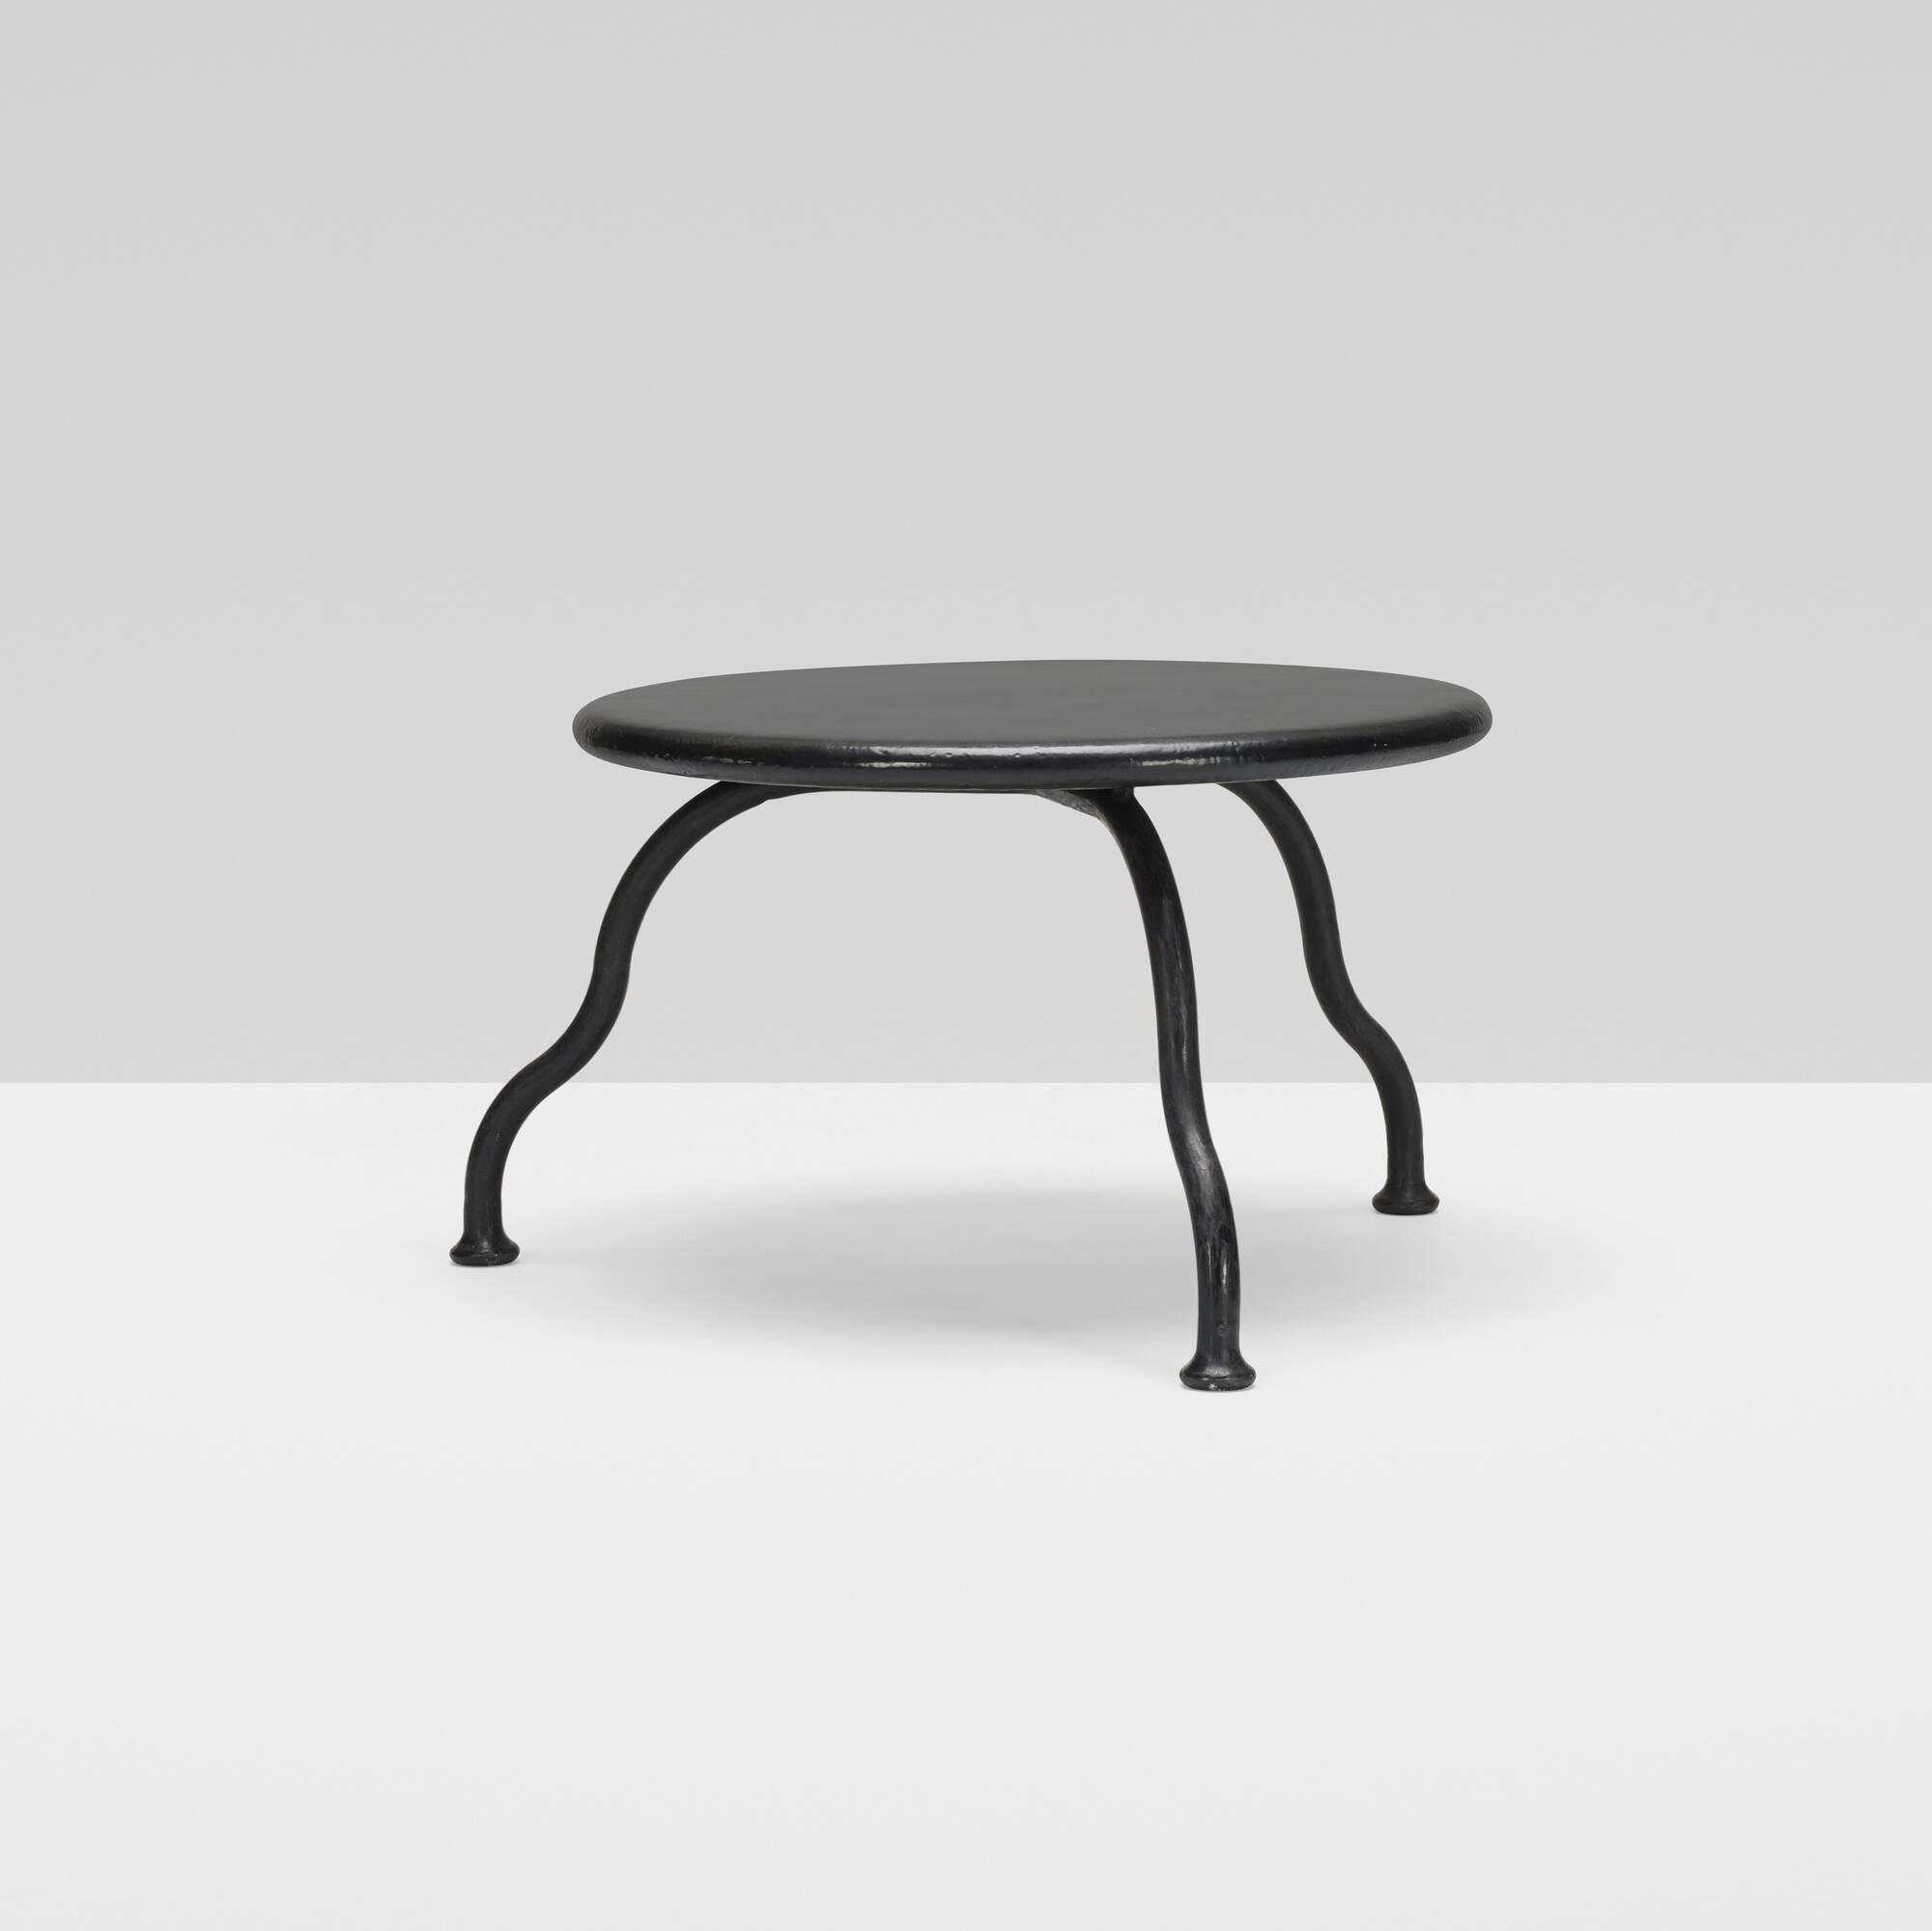 262: Atelier Van Lieshout / Bad Little Table (2 of 3)